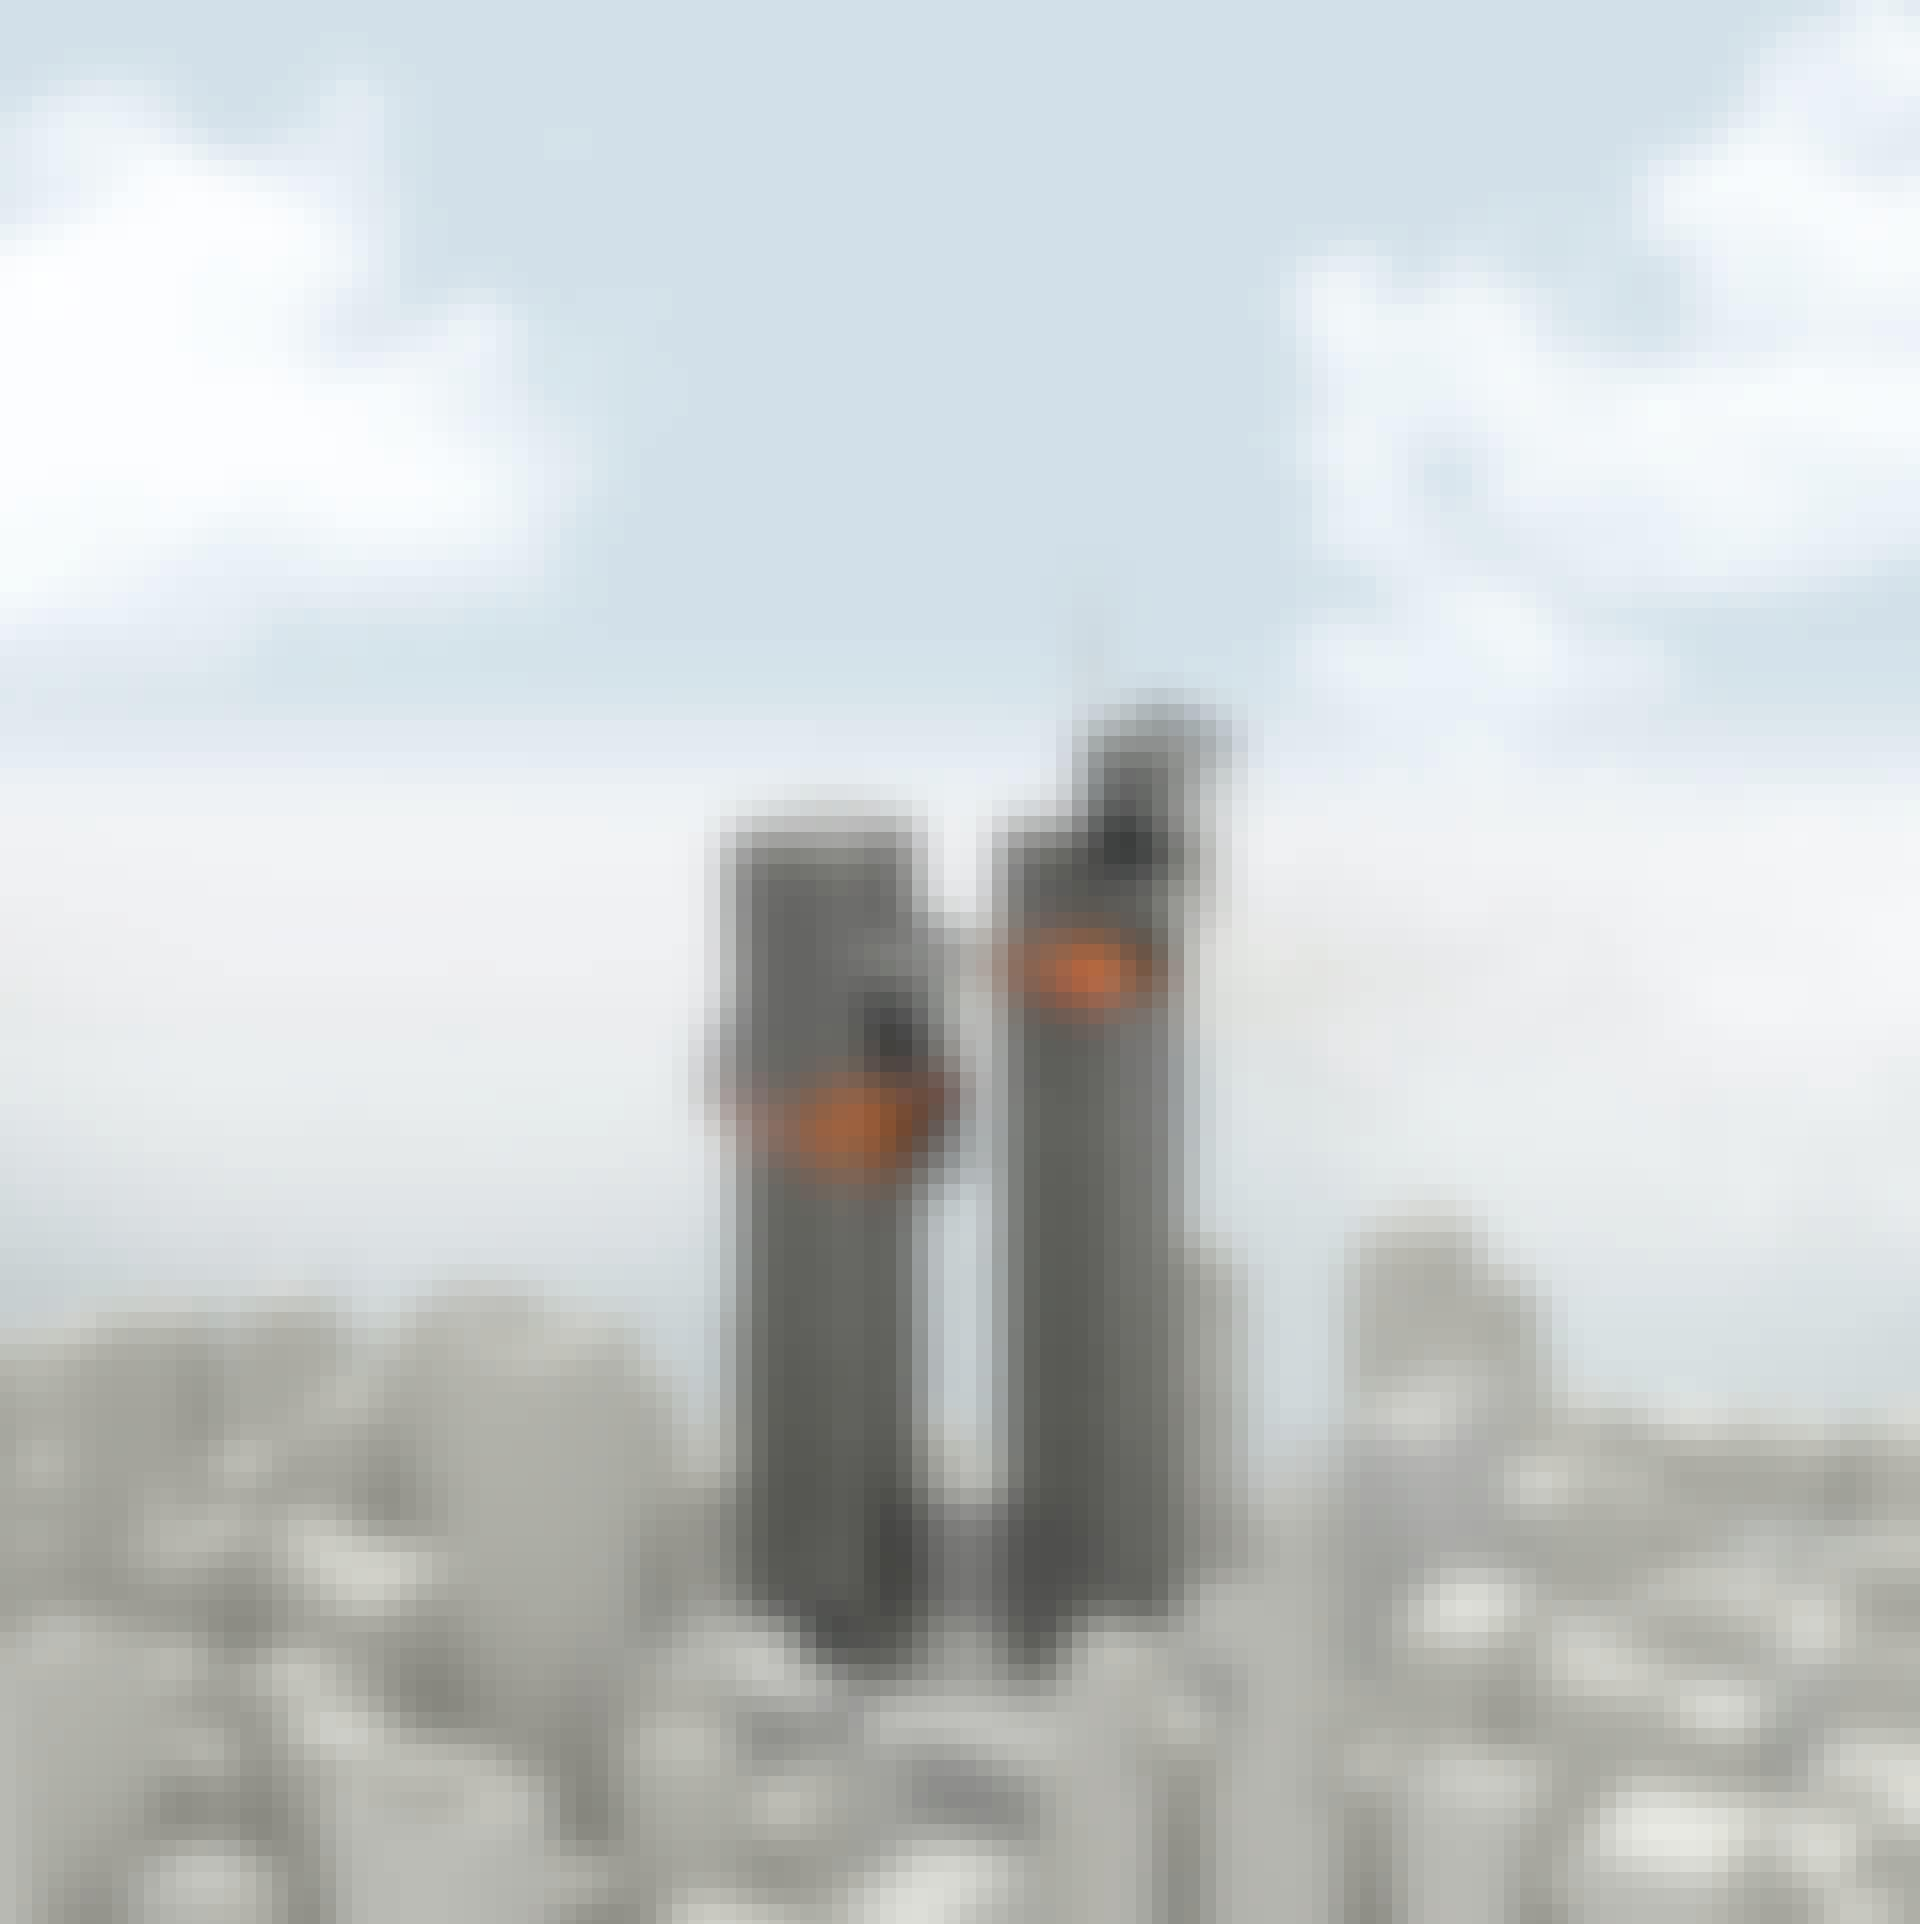 Tornit sortuvat: Vaihe 1